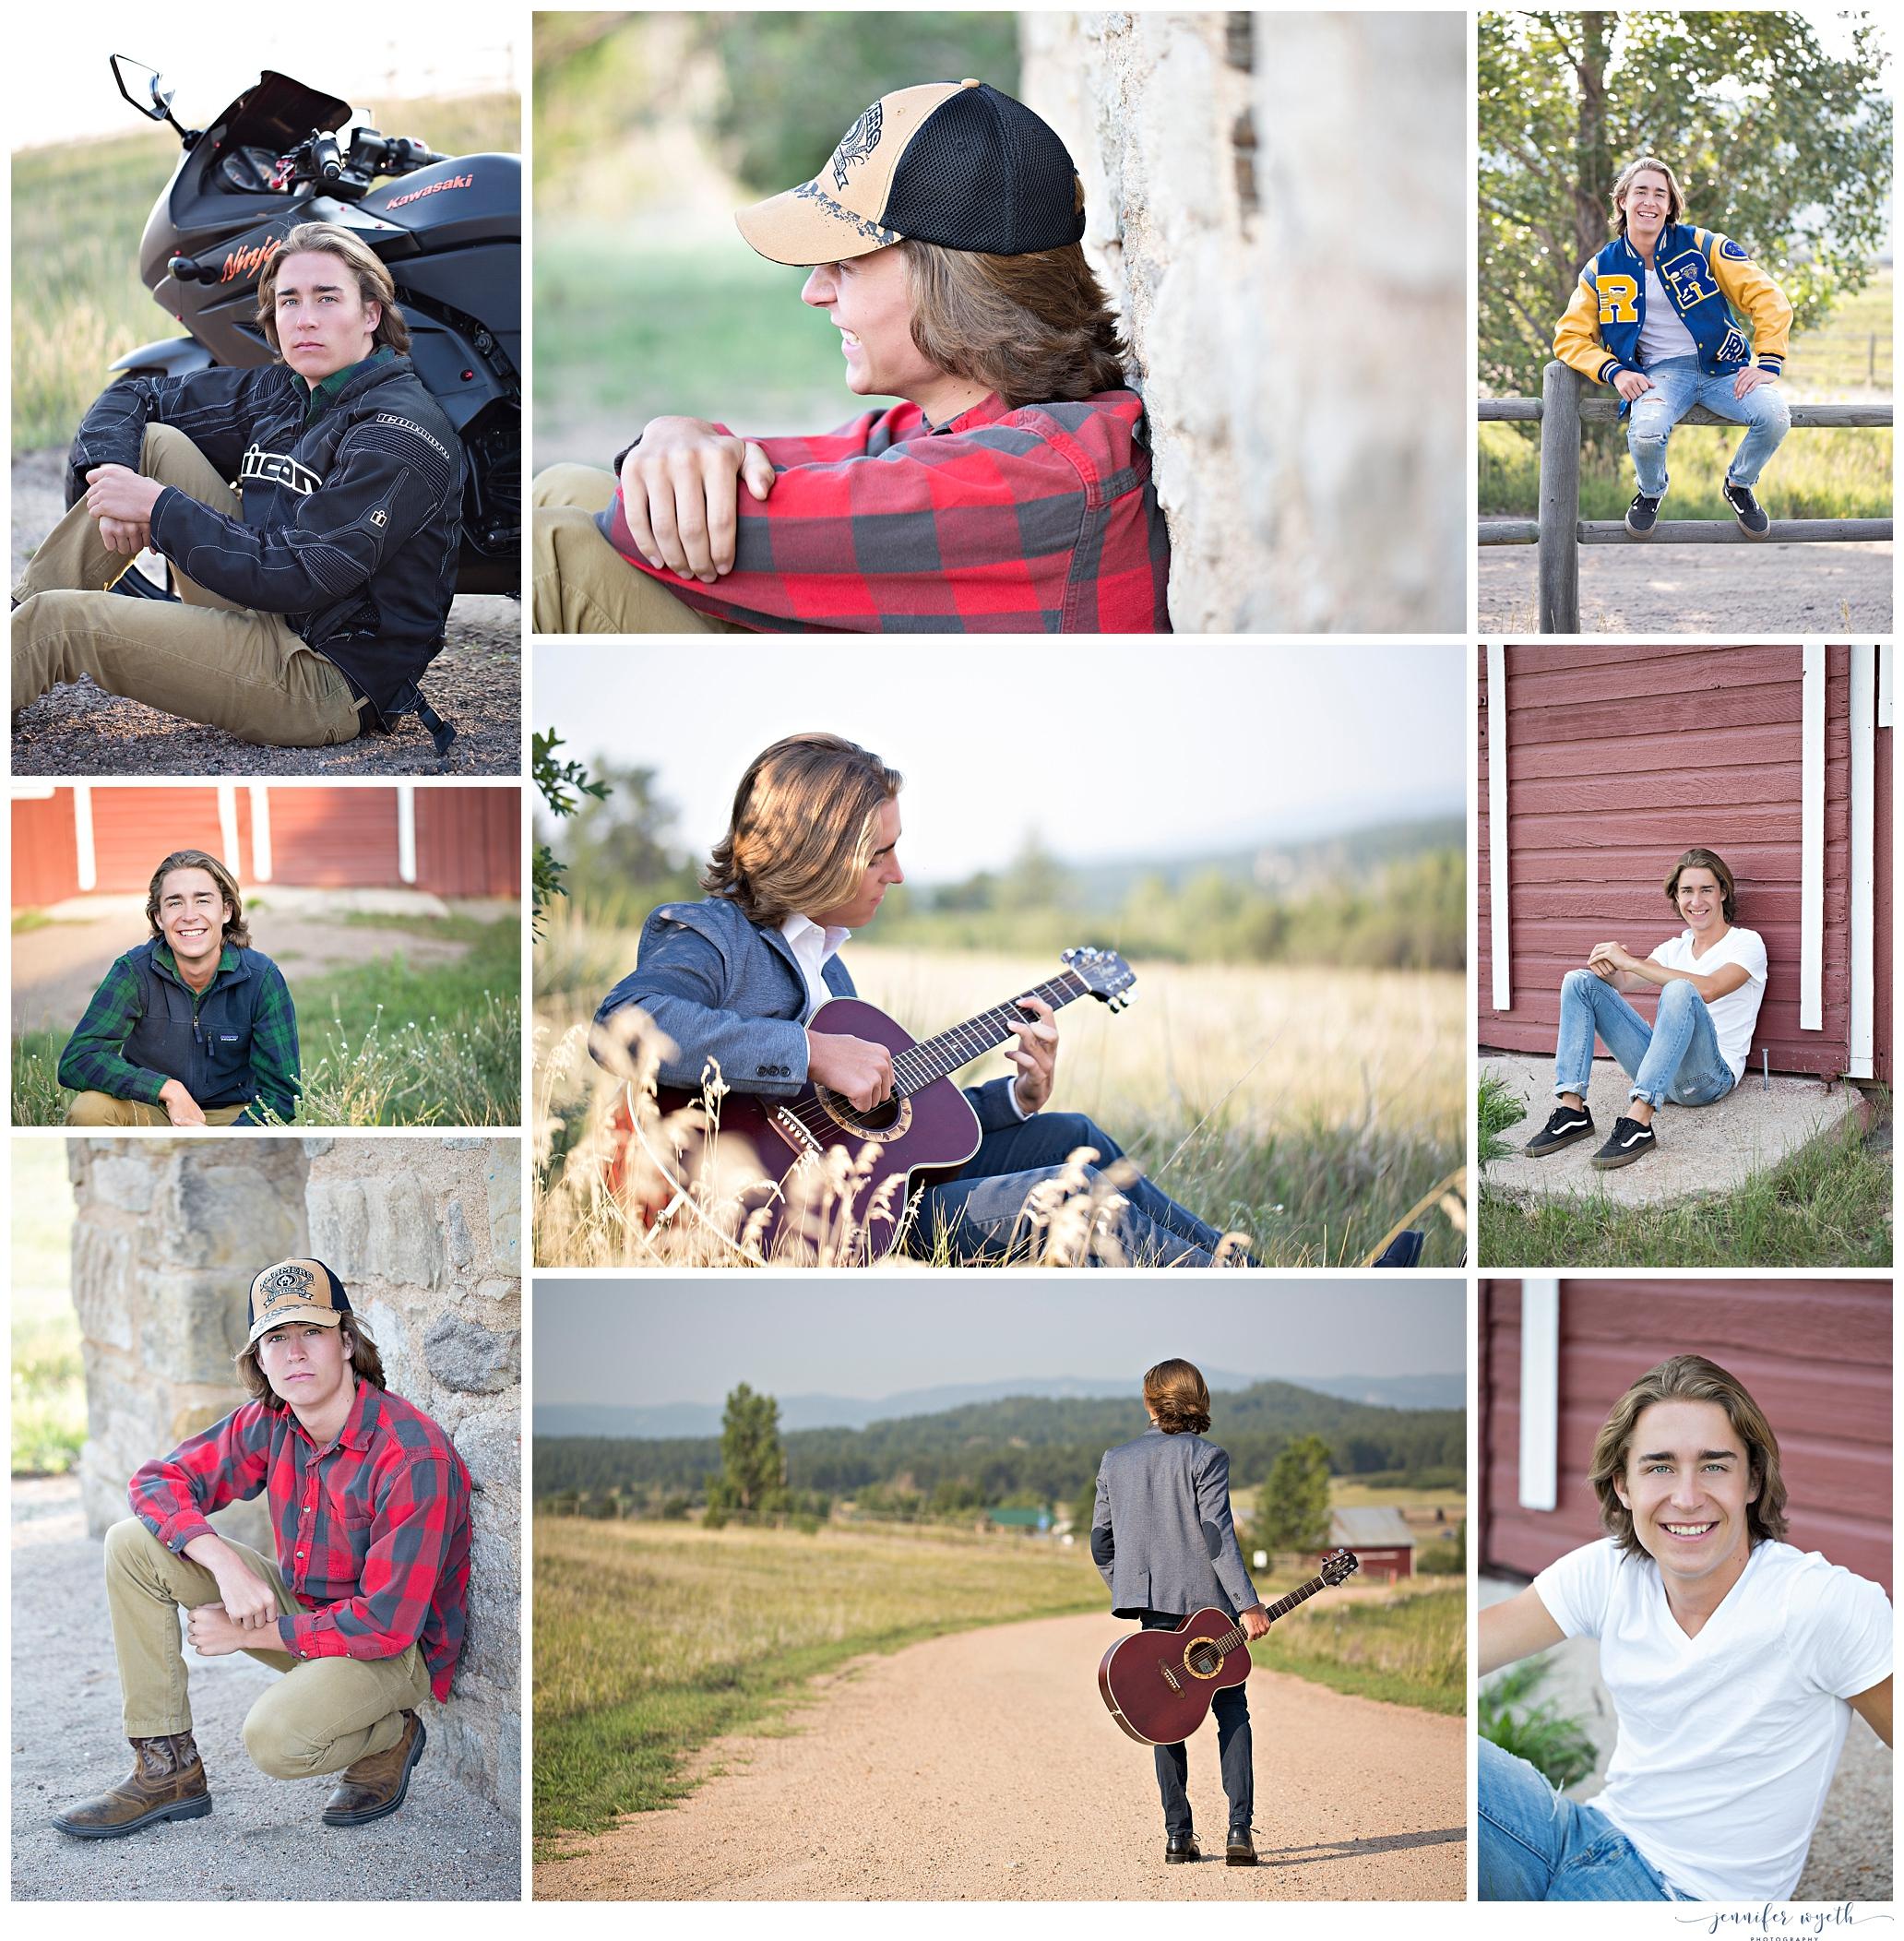 Jennifer-Wyeth-photography-senior-pictures-colorado-springs-photographer_0273.jpg